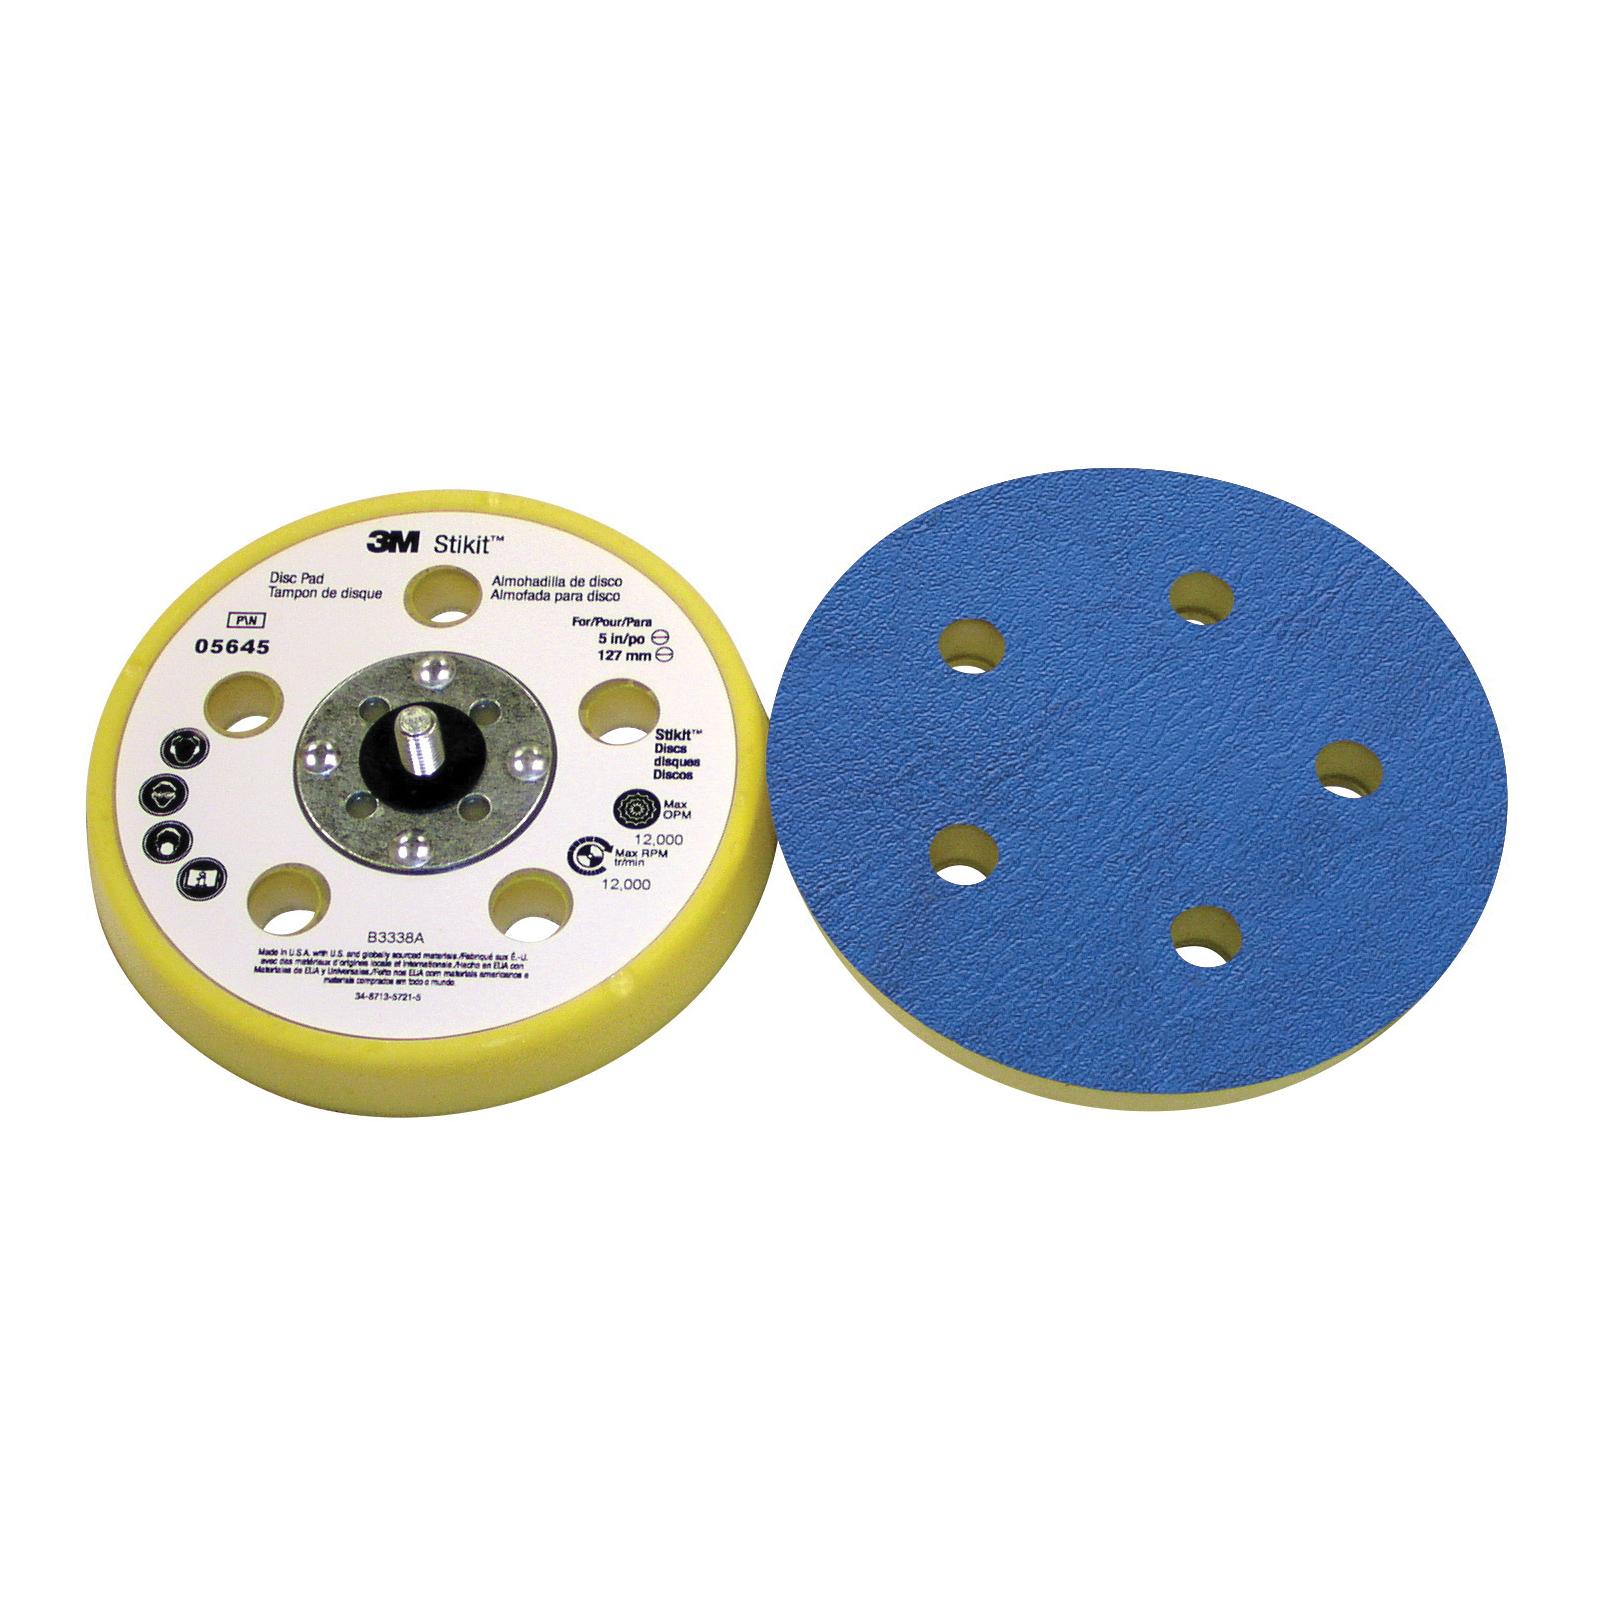 3M™ Stikit™ 051131-05645 Dust Control Soft Density Carbide Burr, 5 in Dia Pad, 3M™ Stikit™ Attachment